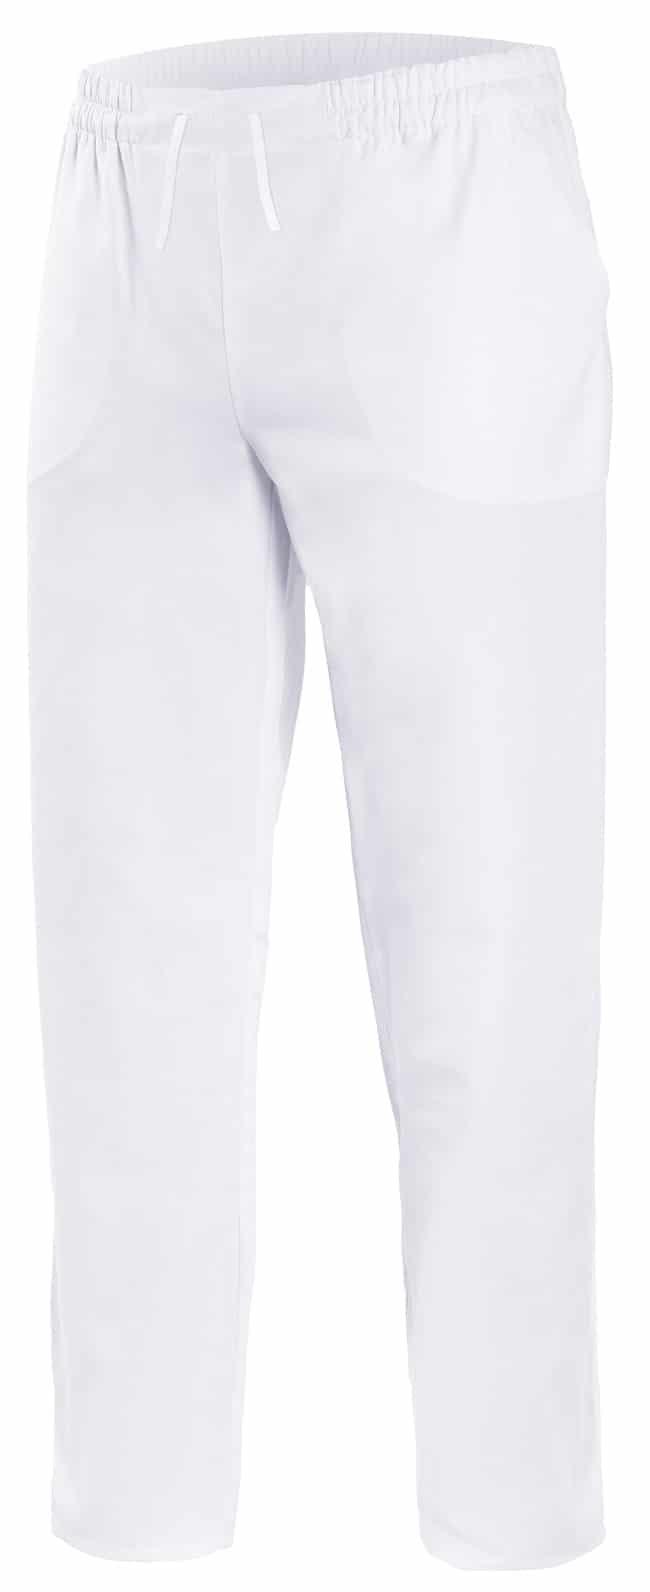 Velilla 533005 PantalÓn Pijama 100% AlgodÓn Blanco